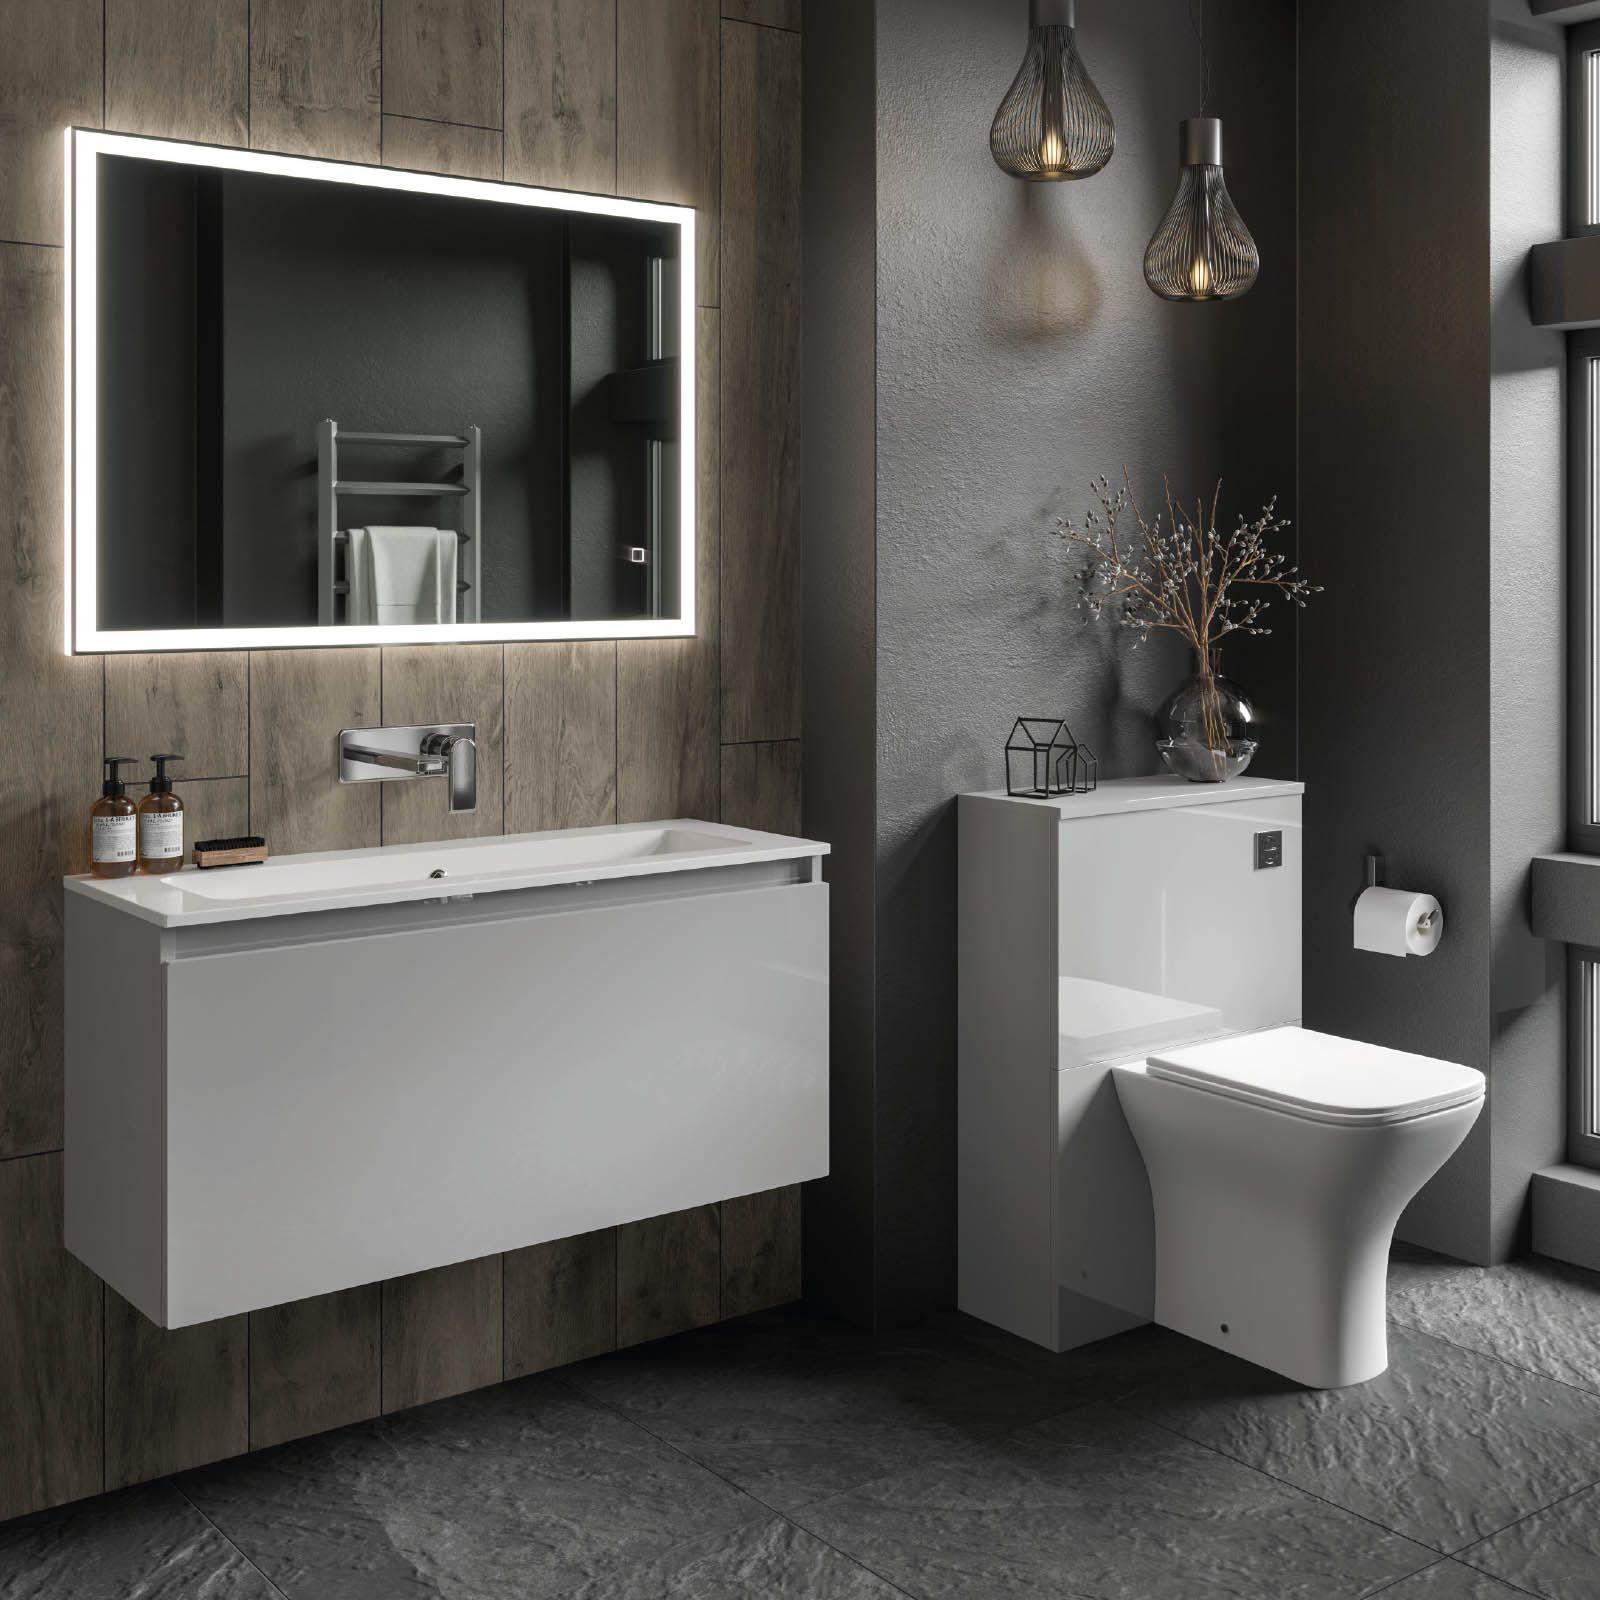 Phoenix Lune Modular Bathroom Furniture Bathroom Furniture Bathroom Furniture